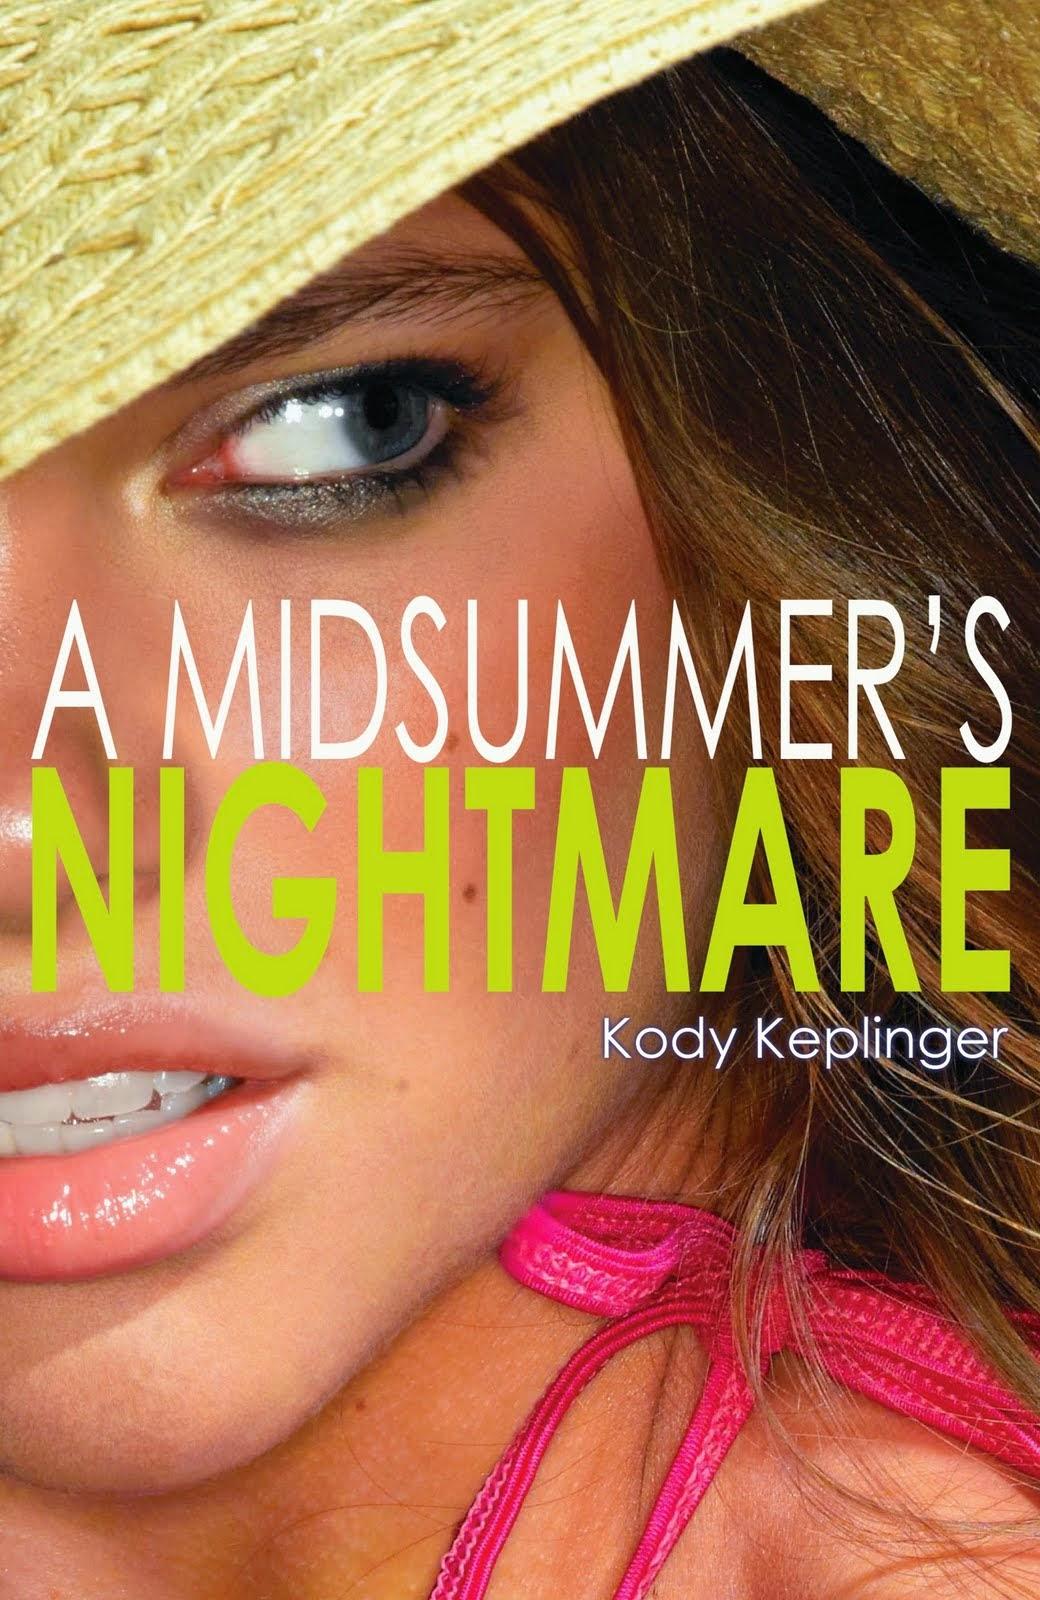 A Midsummer's Nightmare  by Kody Keplinger [Book Cover]